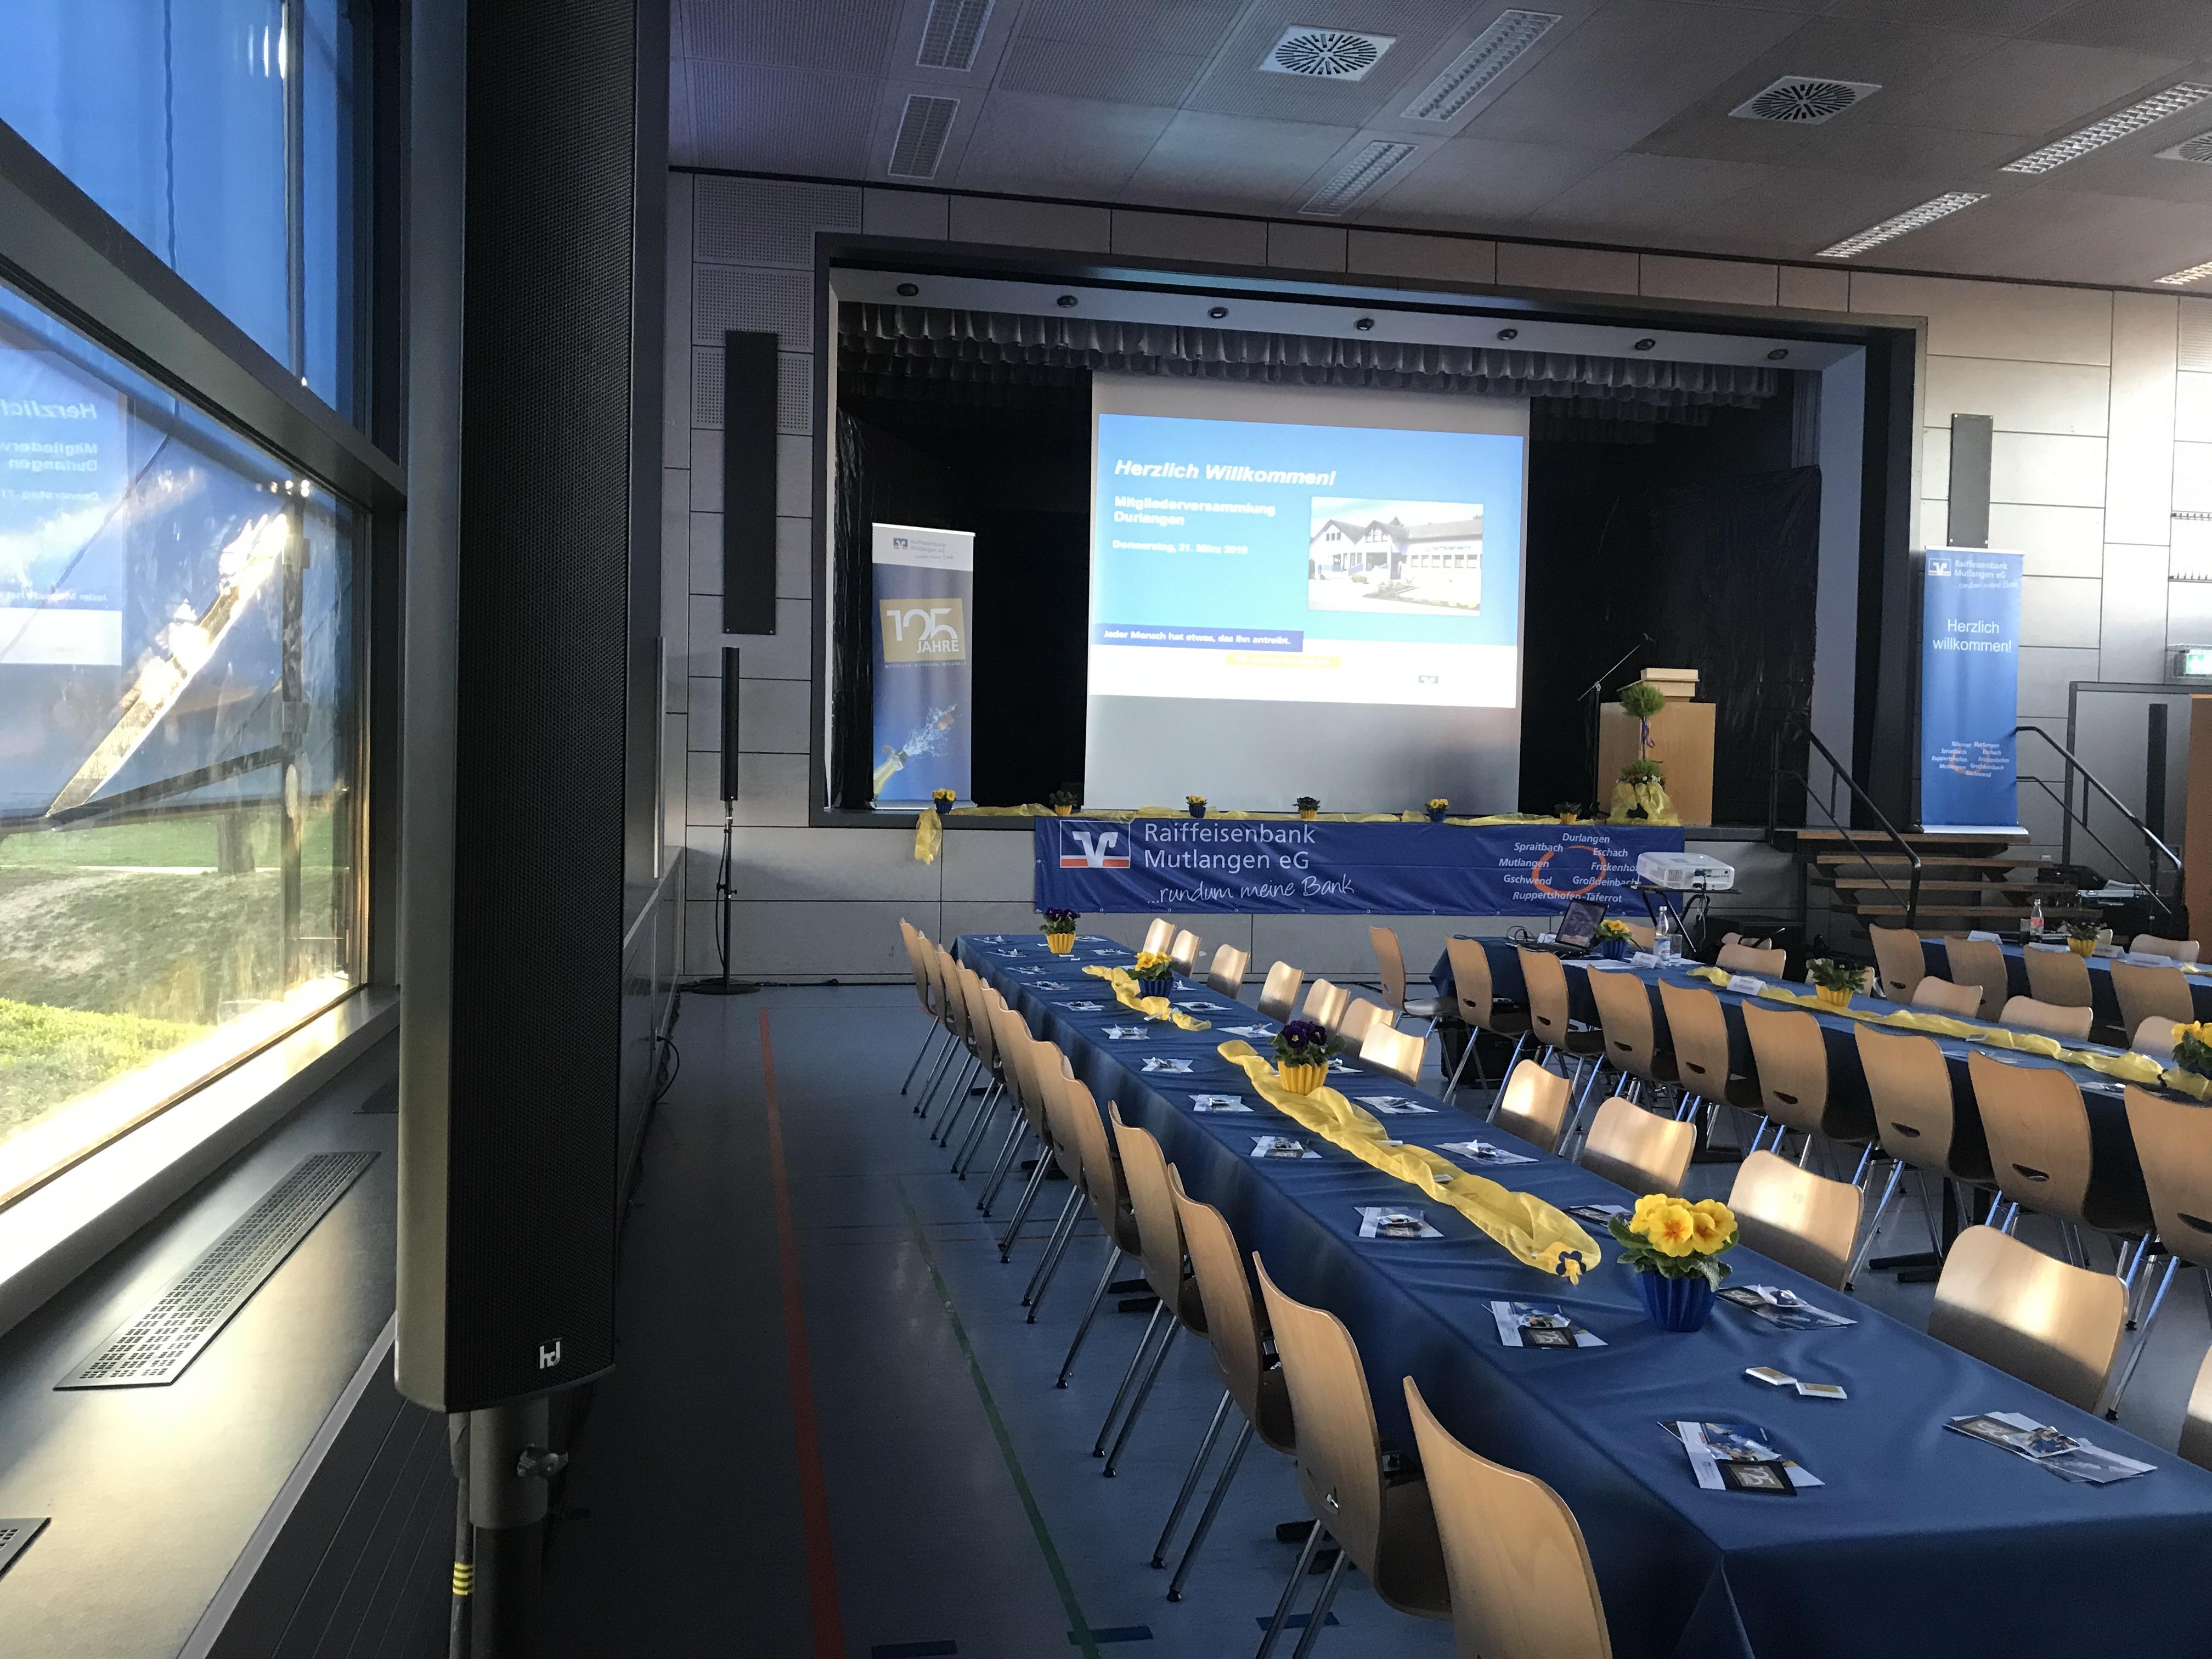 Reiffeisenbank | Meier Eventservice